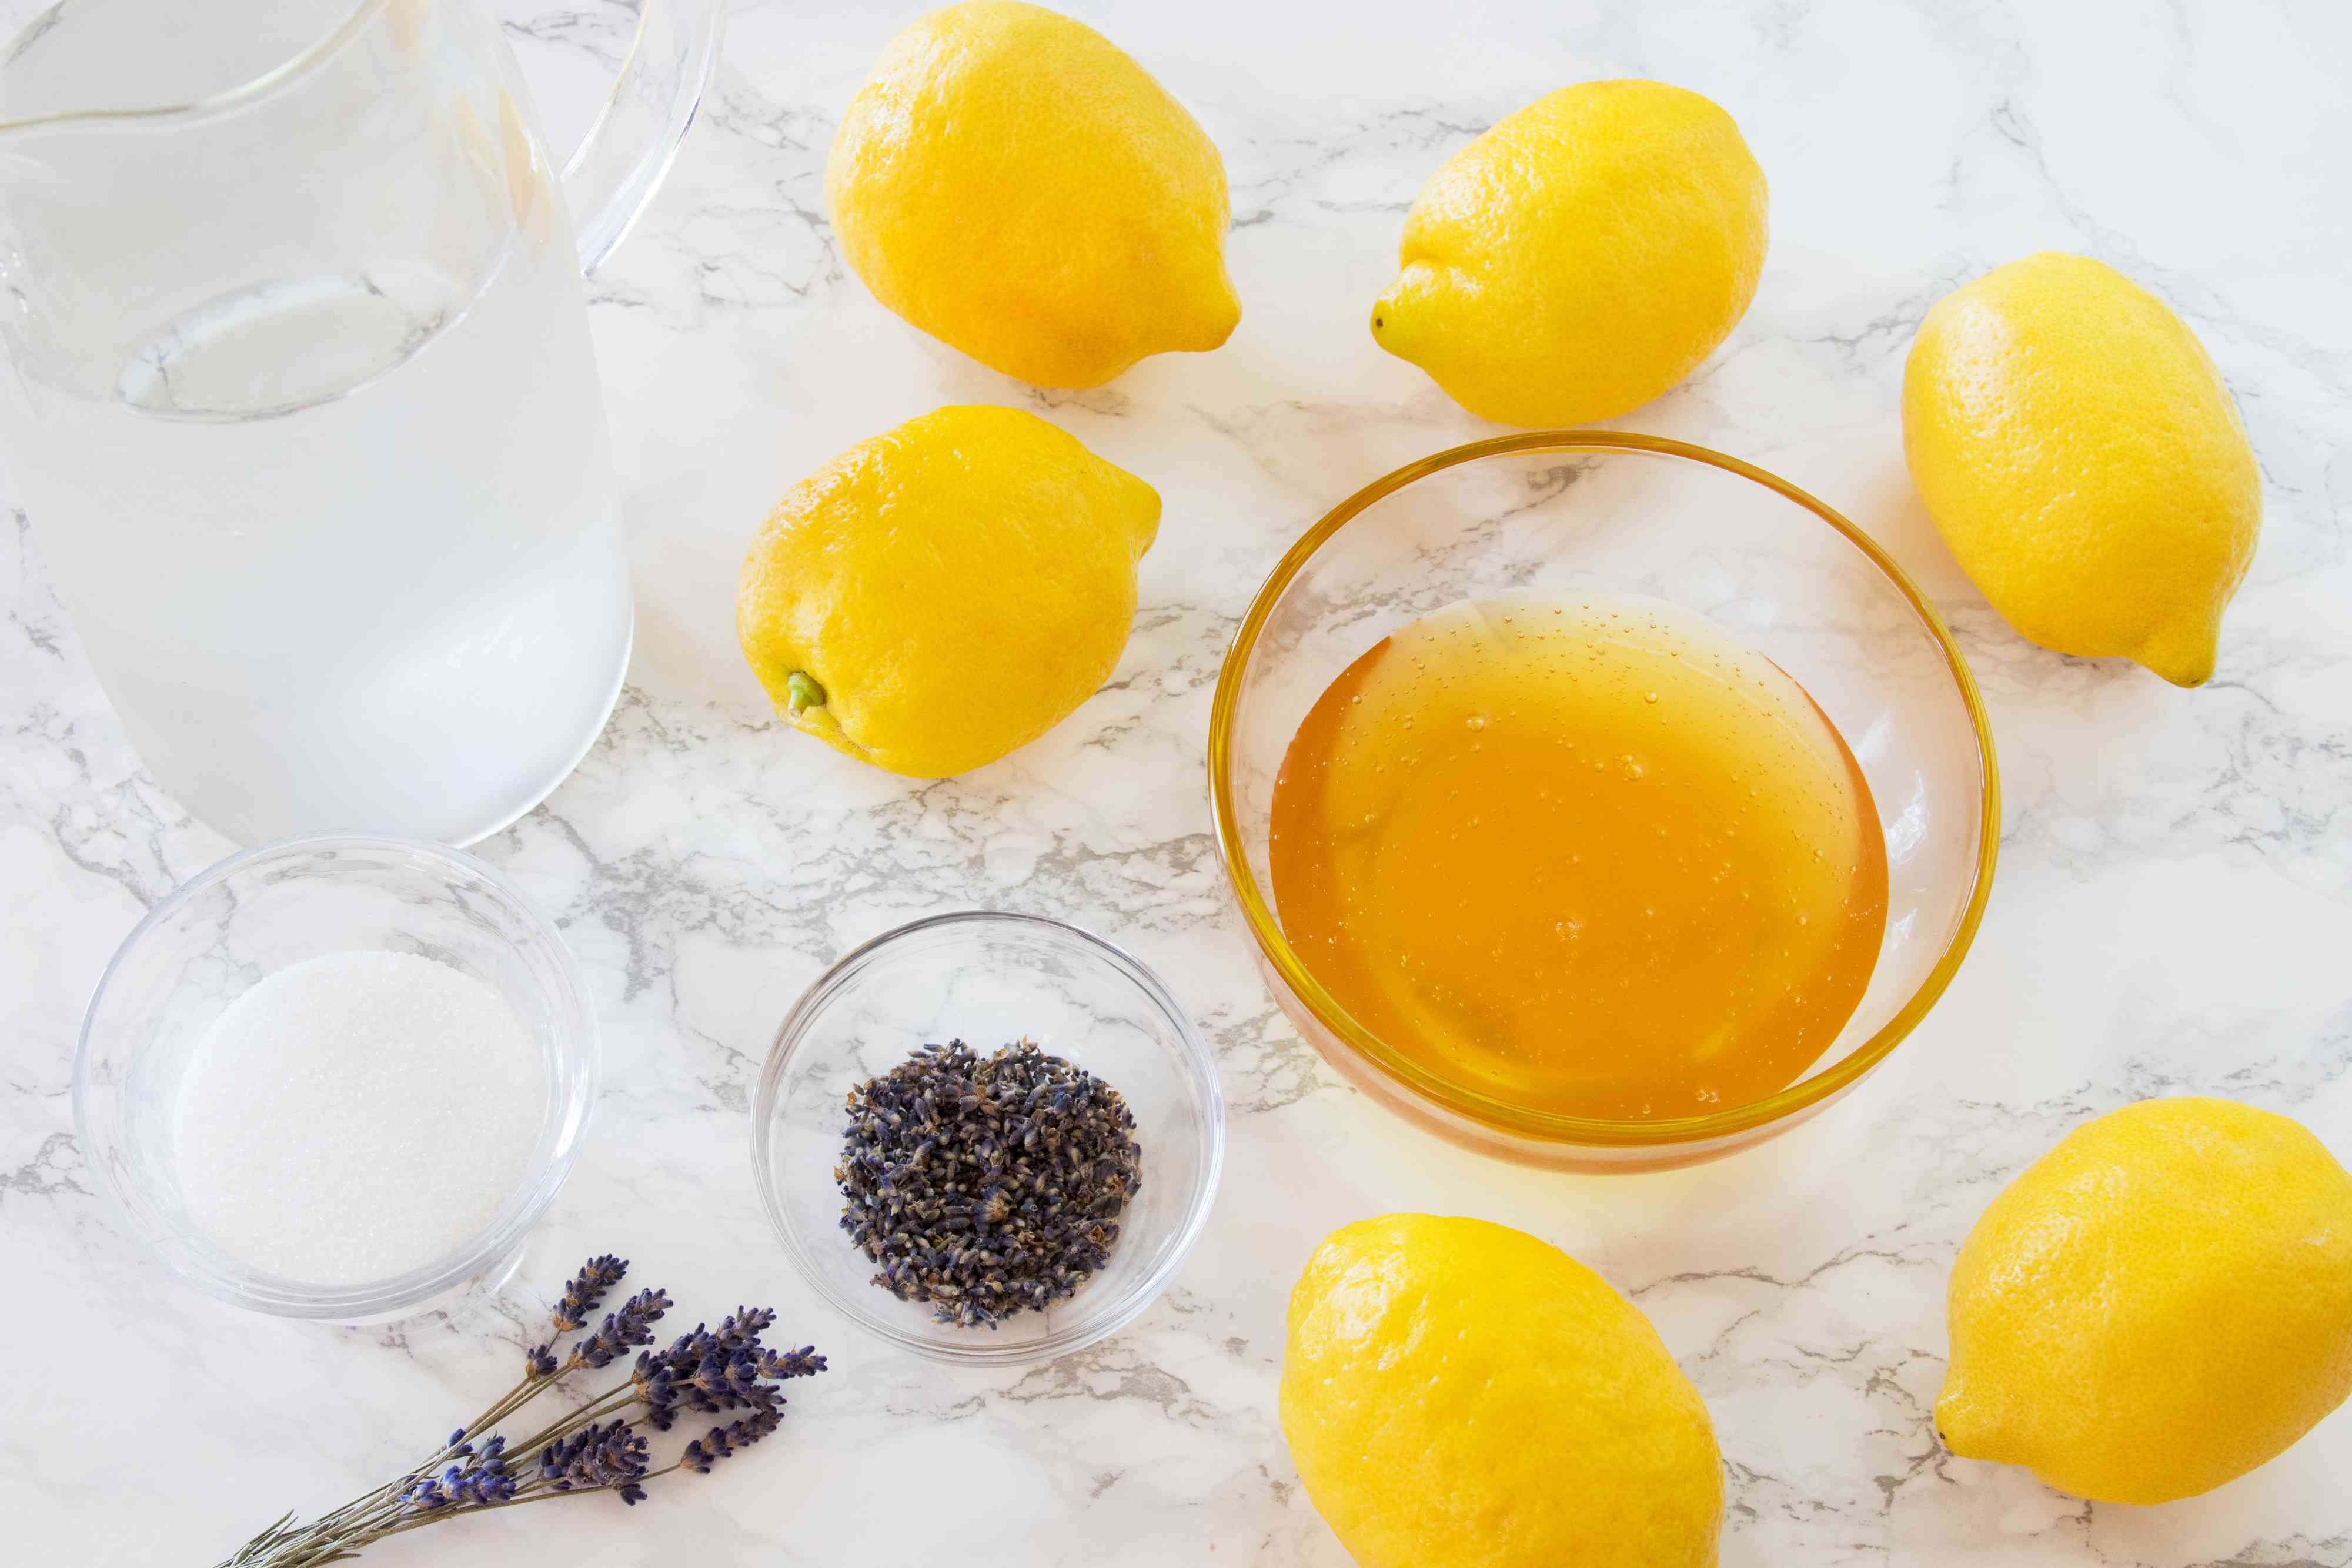 Ingredients for Lavender Lemonade